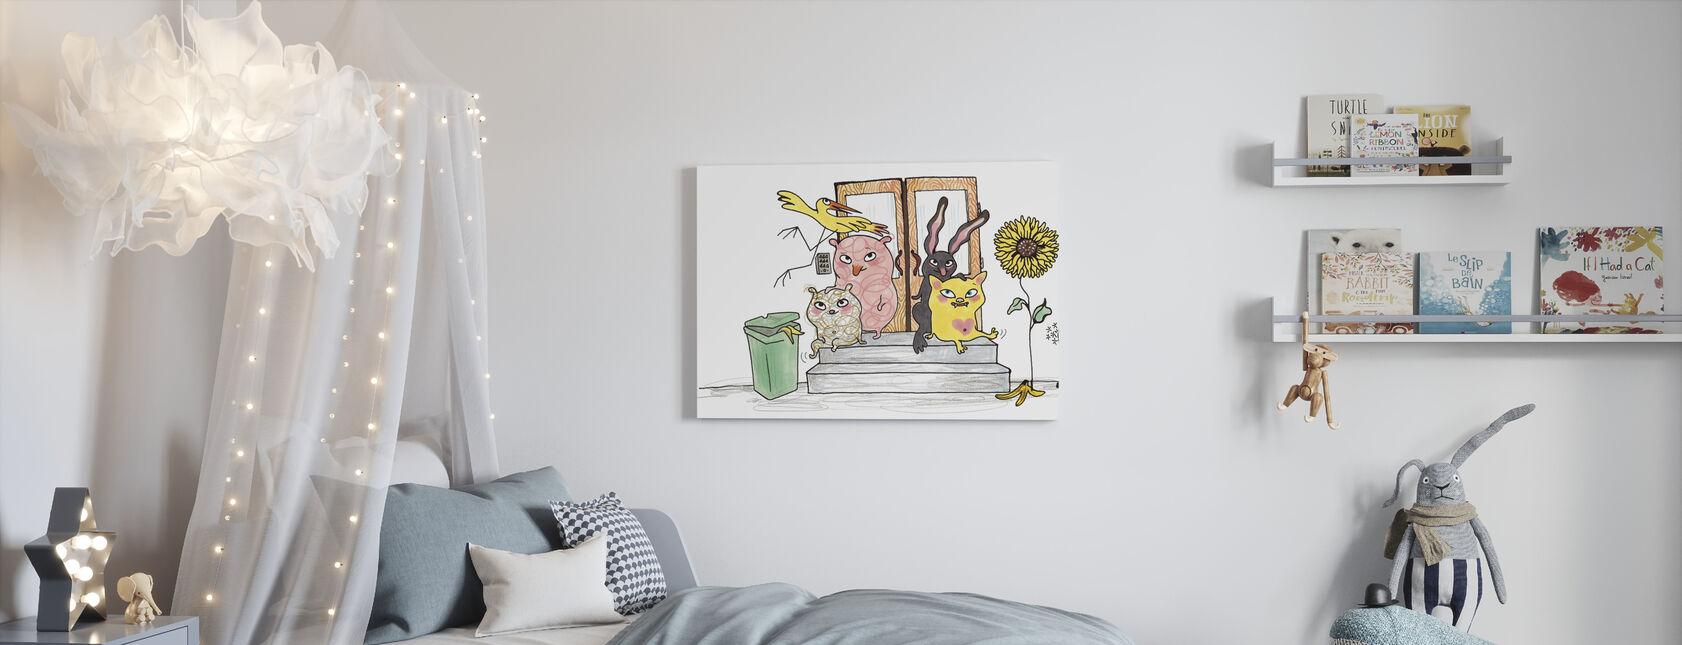 Wie woont hier? - Canvas print - Kinderkamer